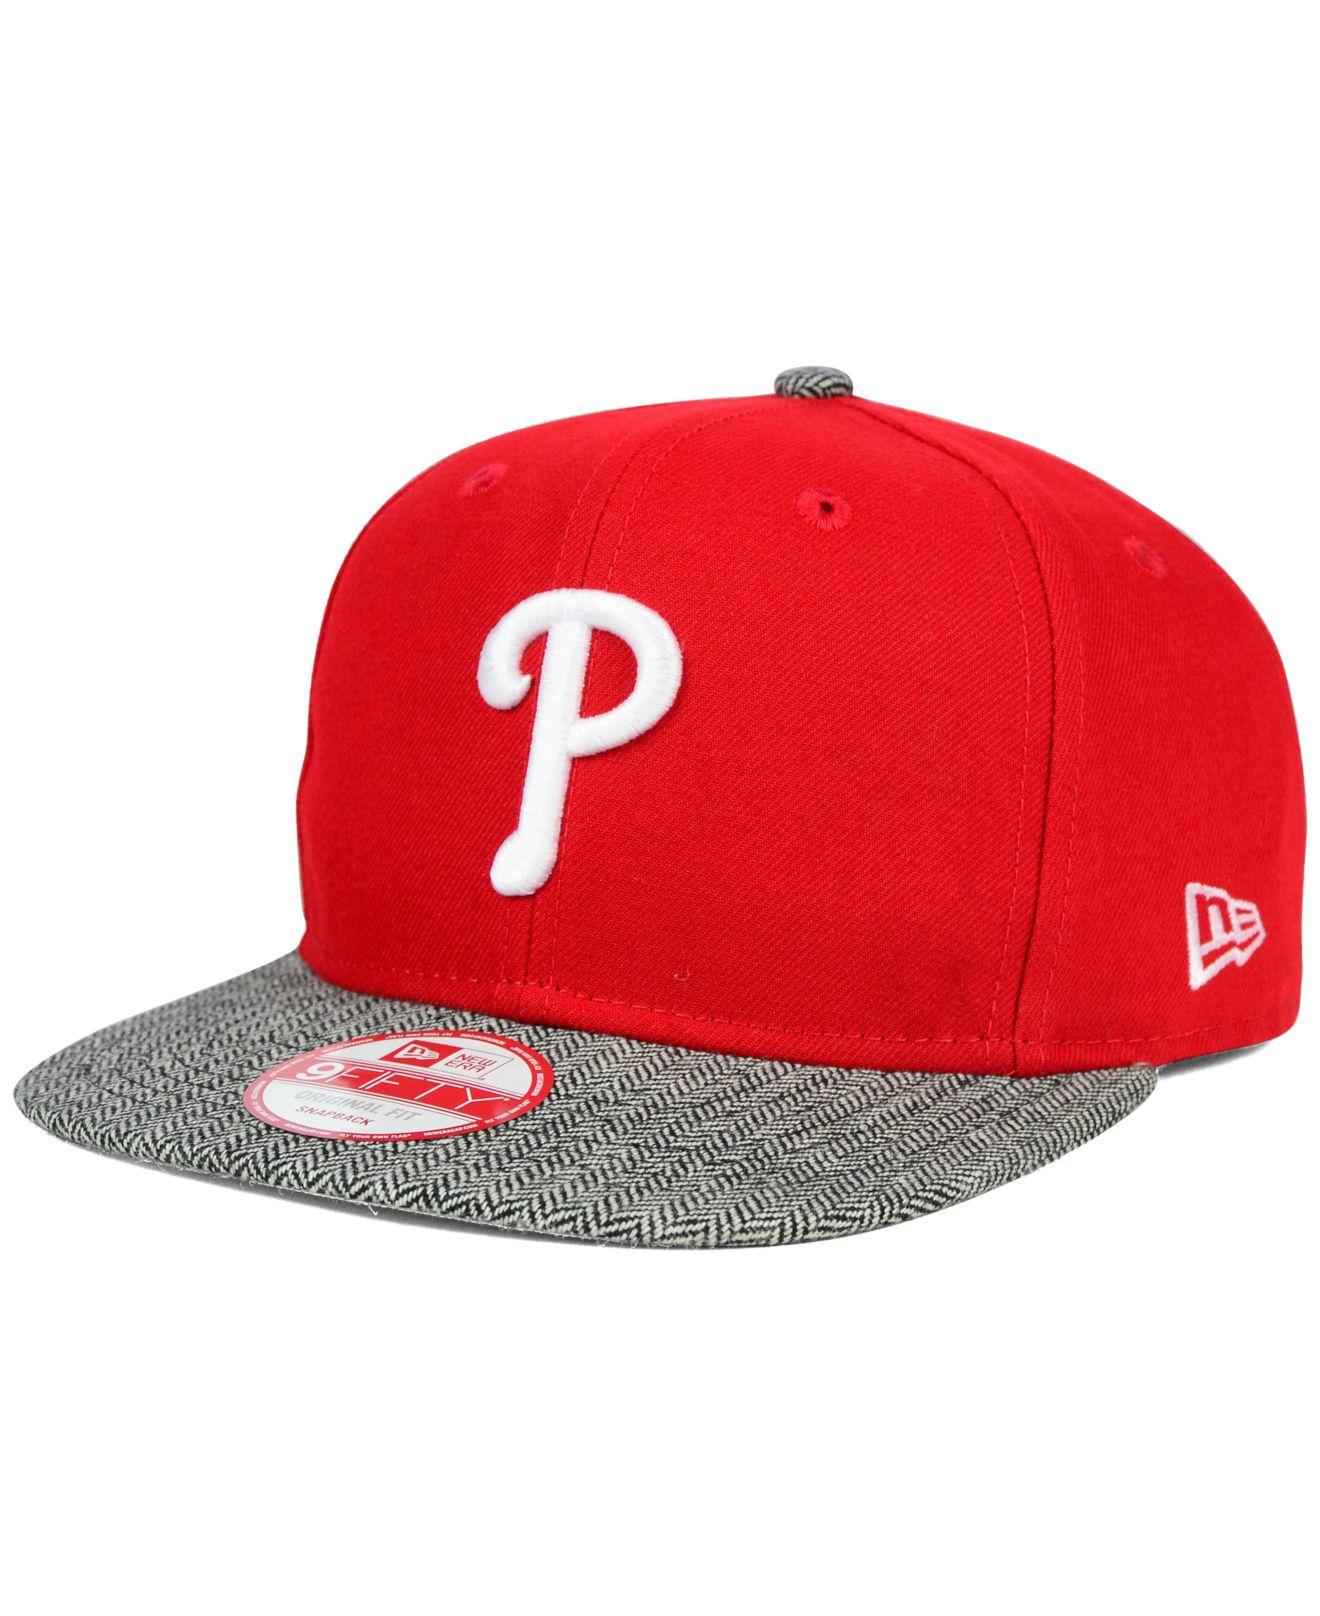 af854d822e4 Lyst - Ktz Philadelphia Phillies Premium 9fifty Snapback Cap in Red ...